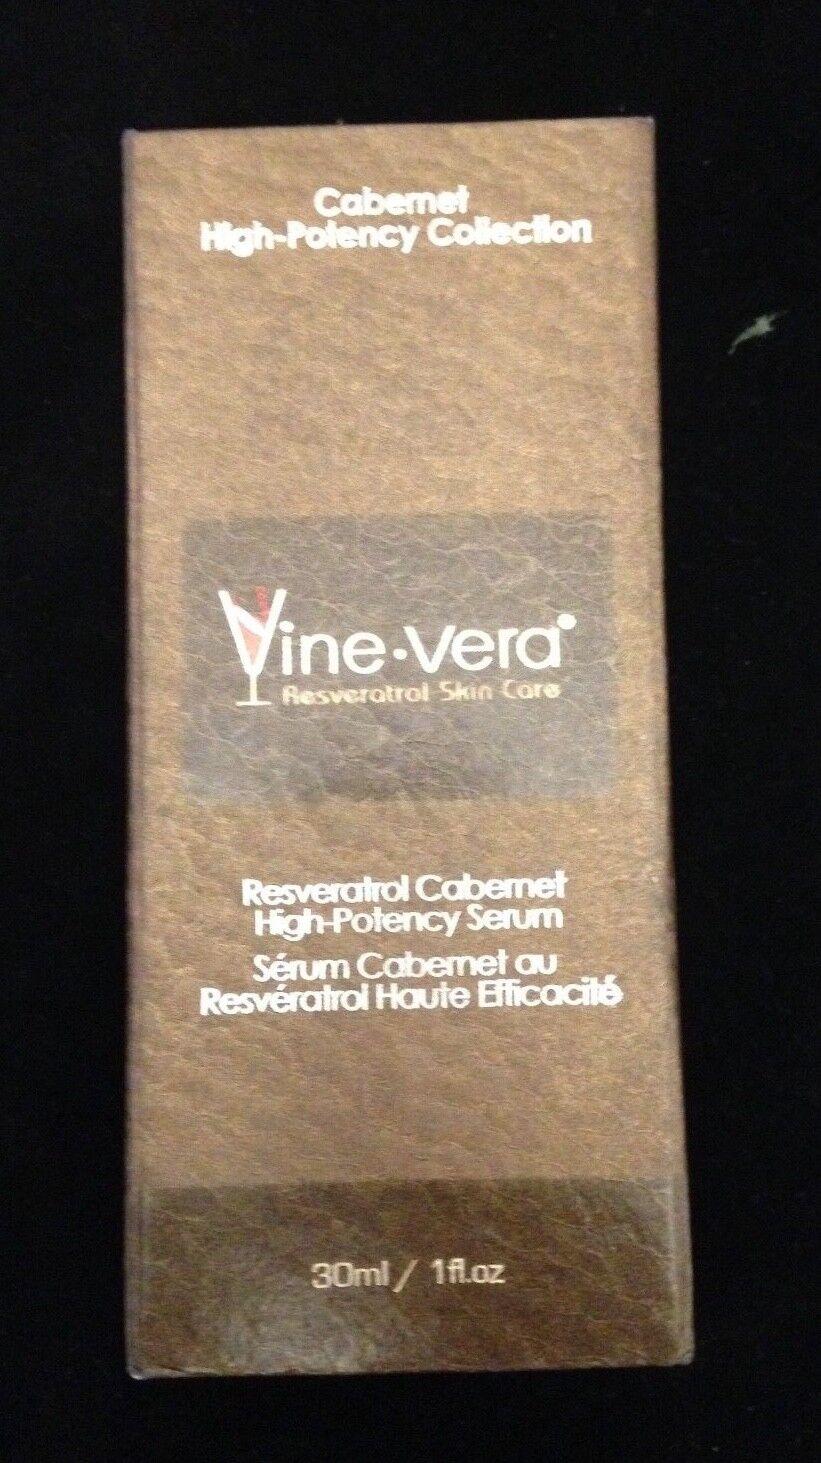 Vine Vera Resveratrol Cabernet High Potency Eye Serum 50ml